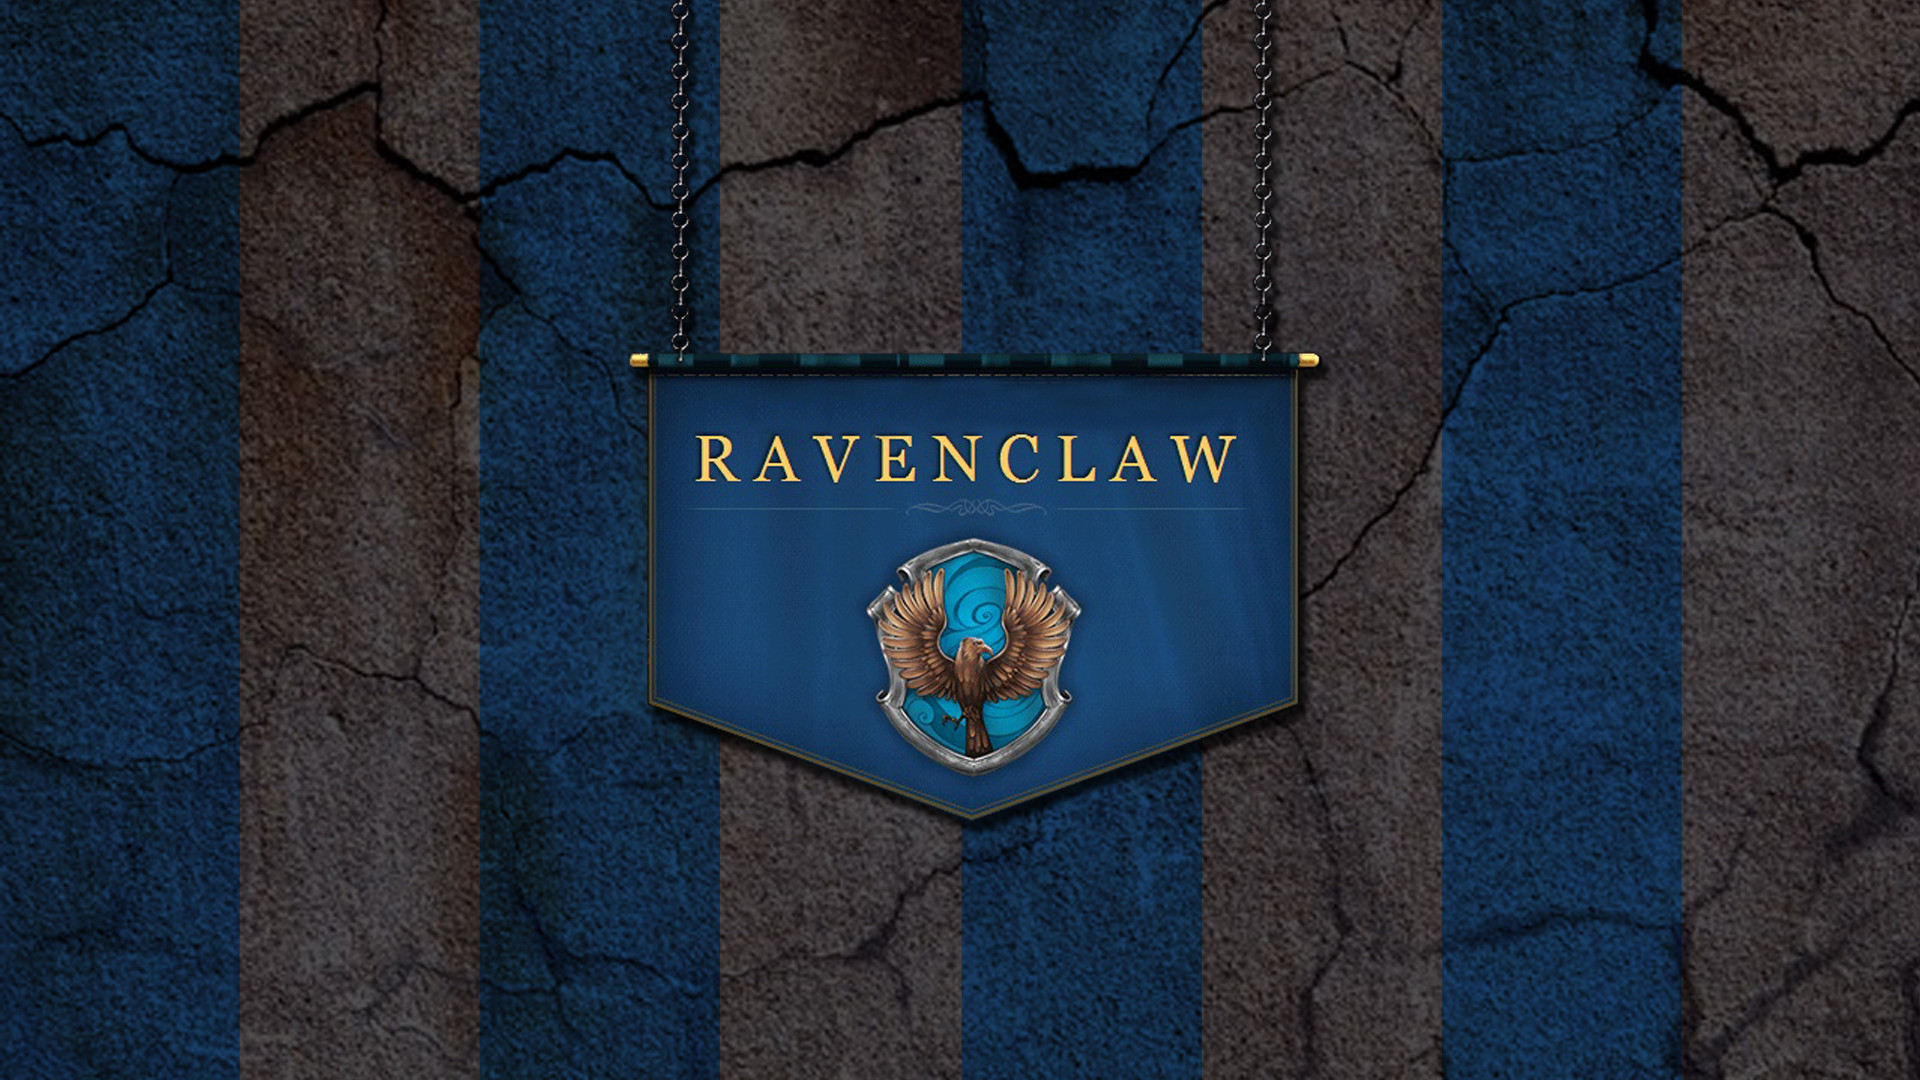 Ravenclaw Wallpaper HD